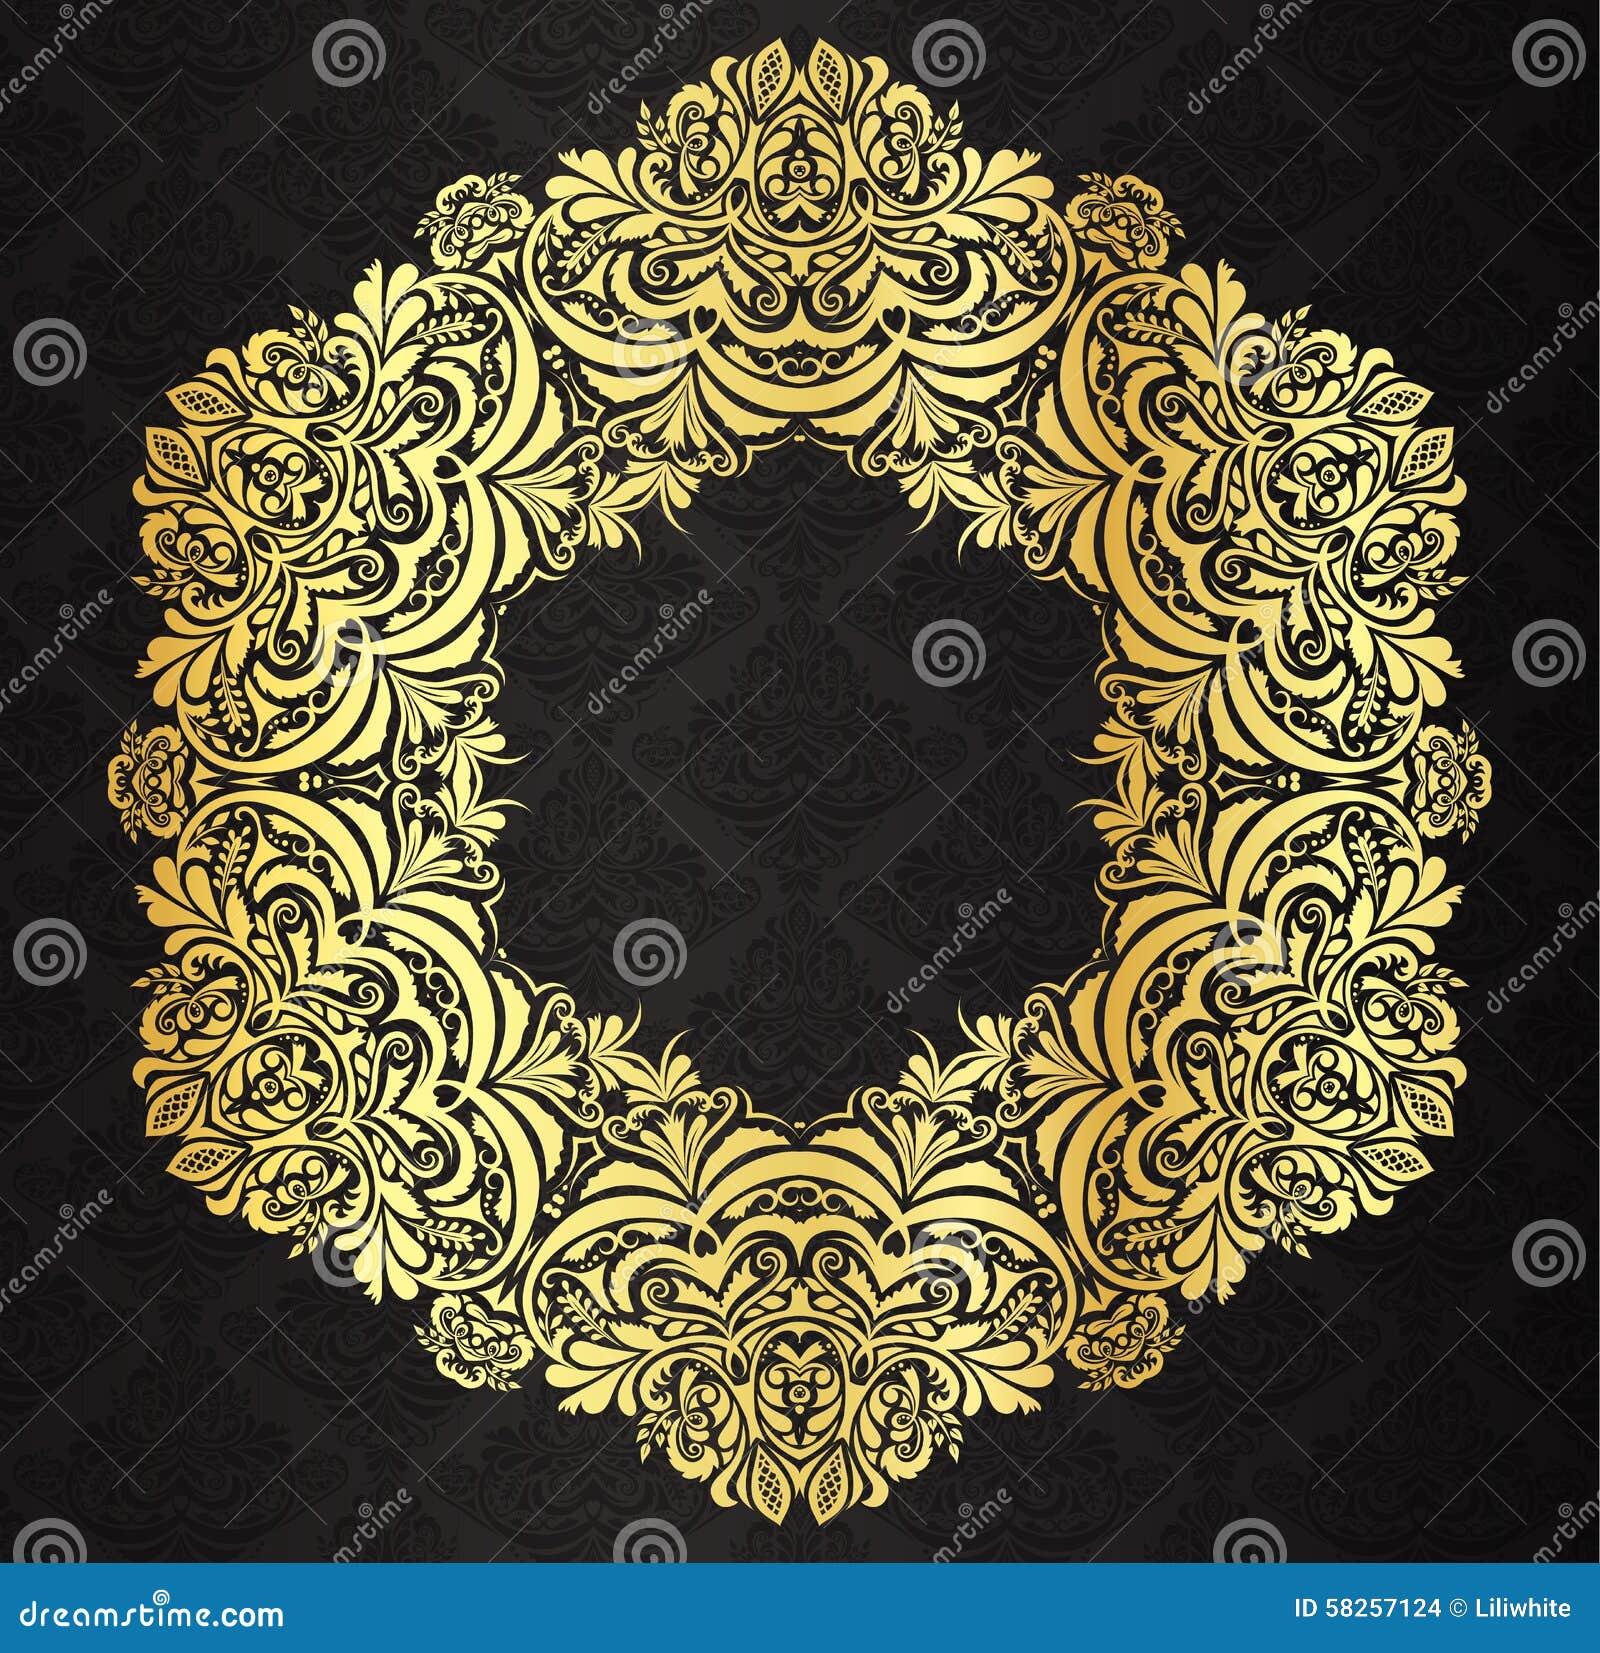 Decorative Golden Vintage Frame With Black Victori Stock ...